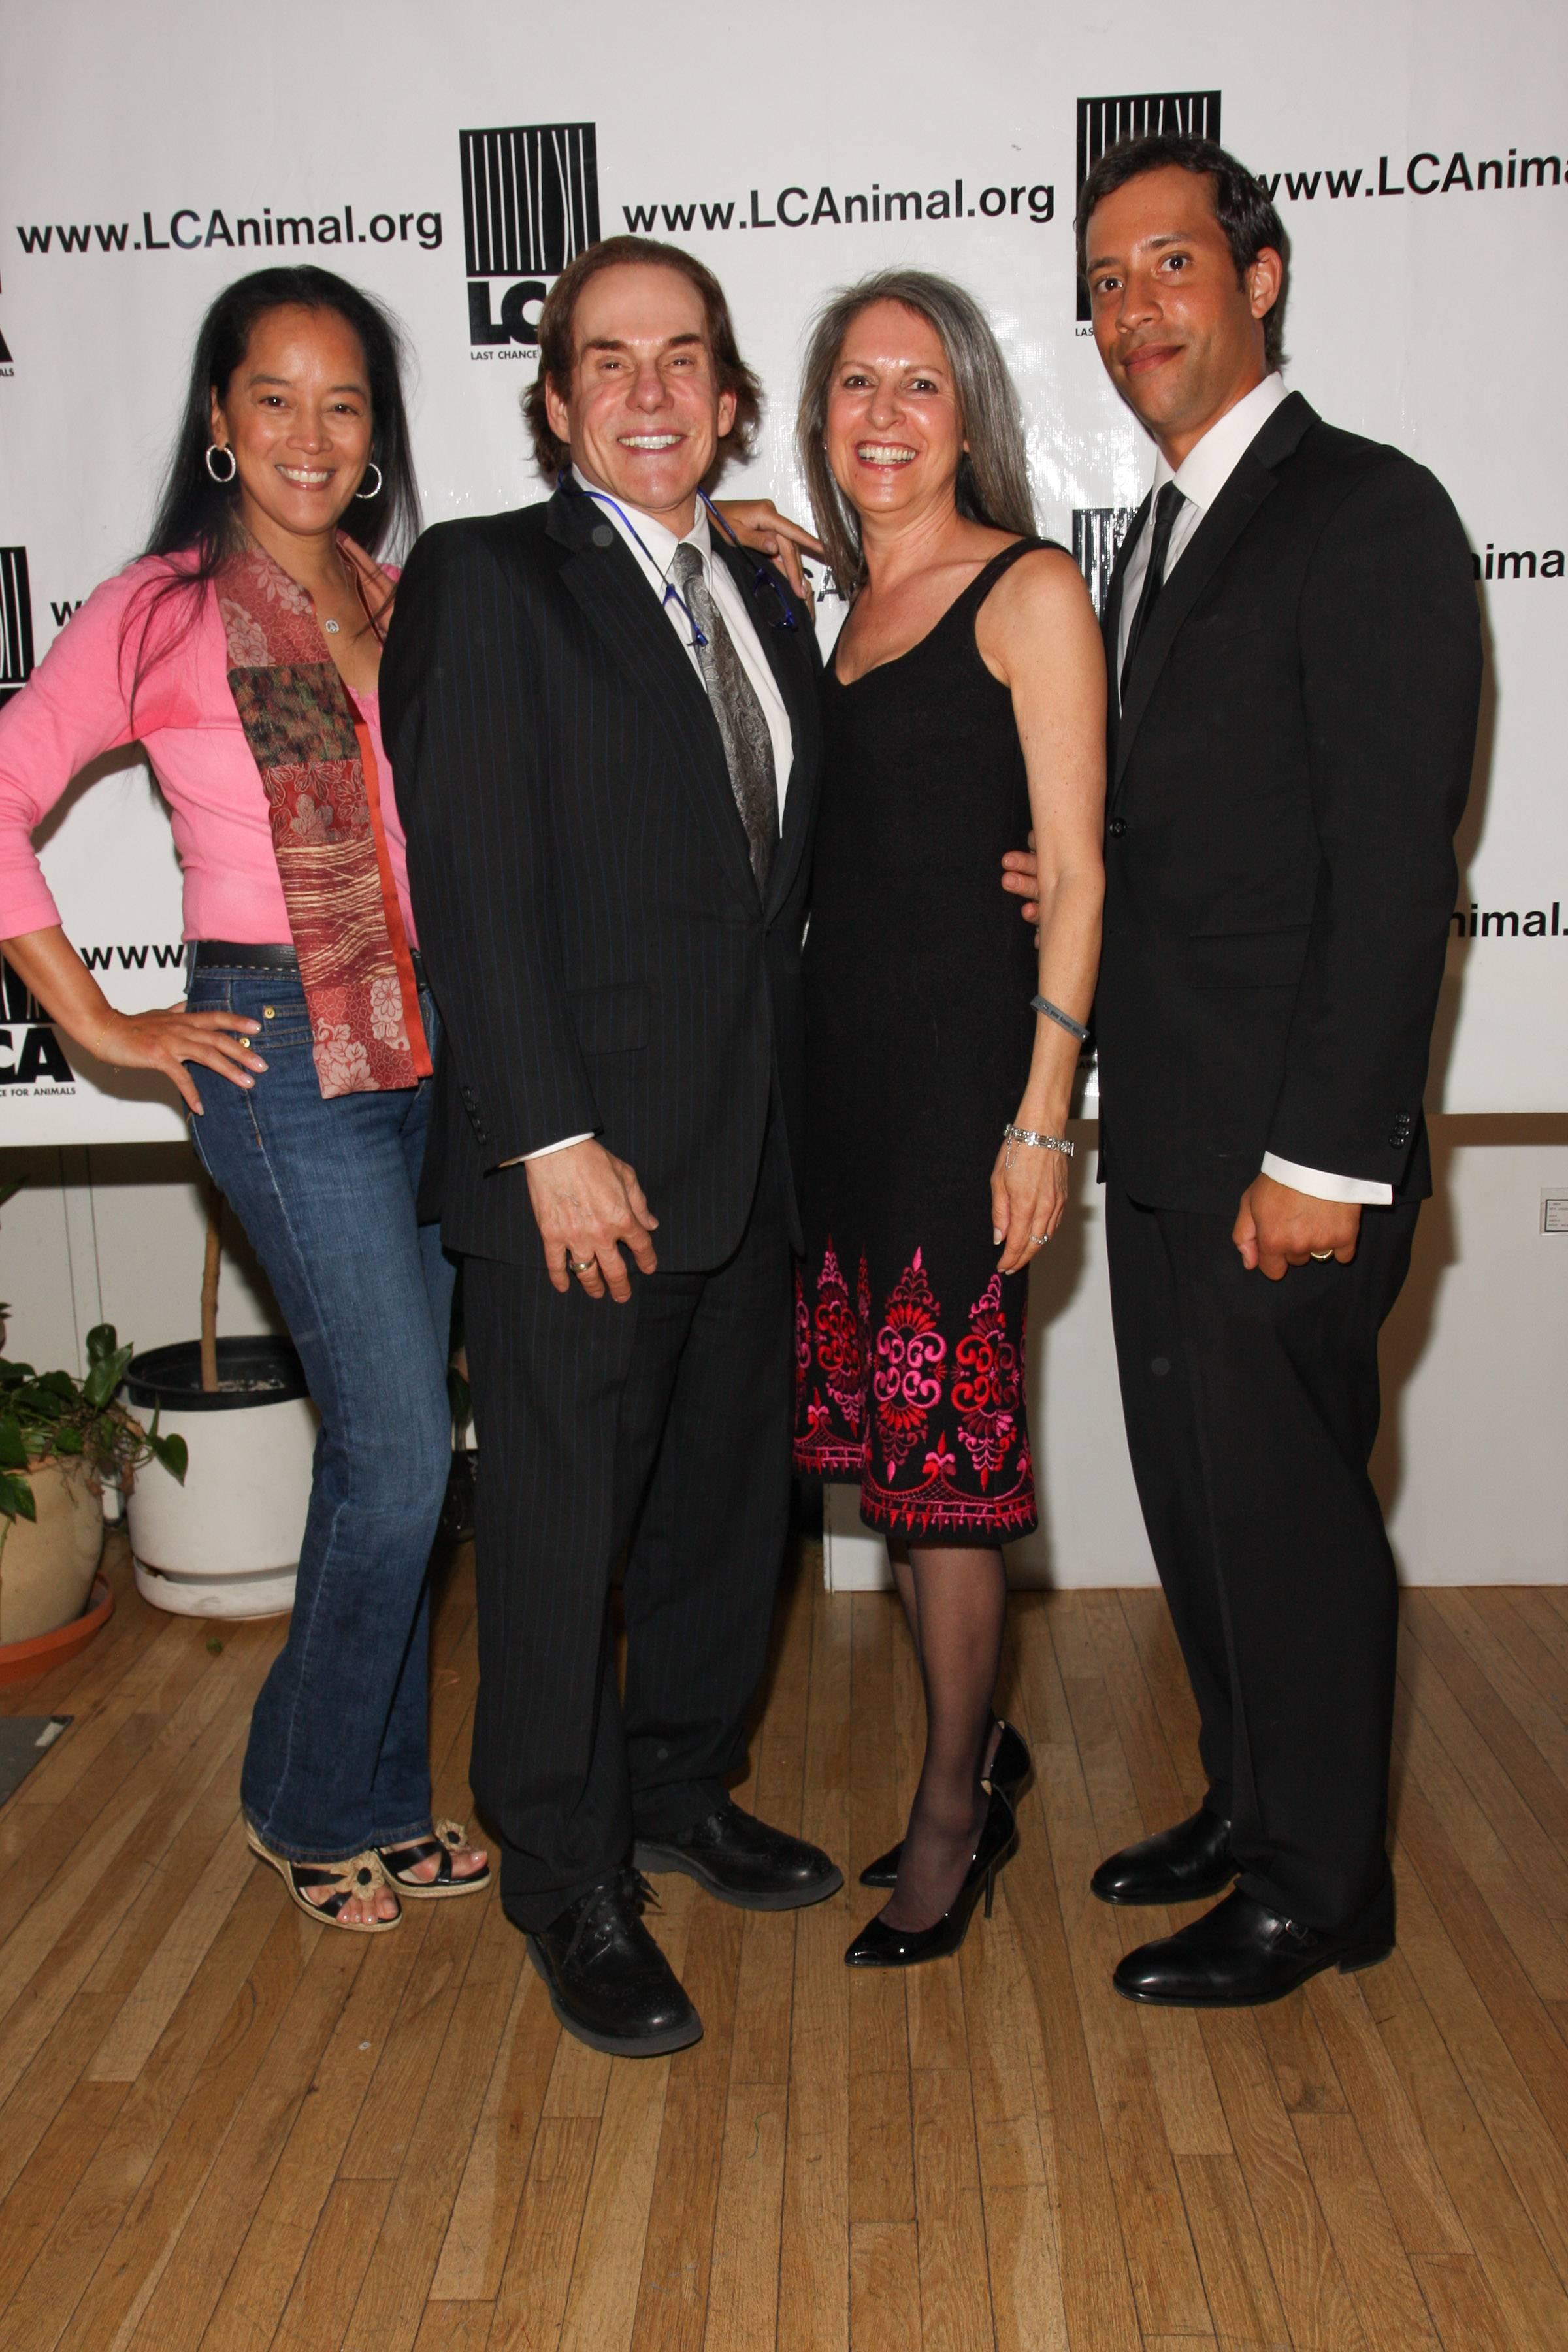 2.Cassandra Seidenfeld, R. Couri Hay, Nancy Silberkleit, Joe Alexander